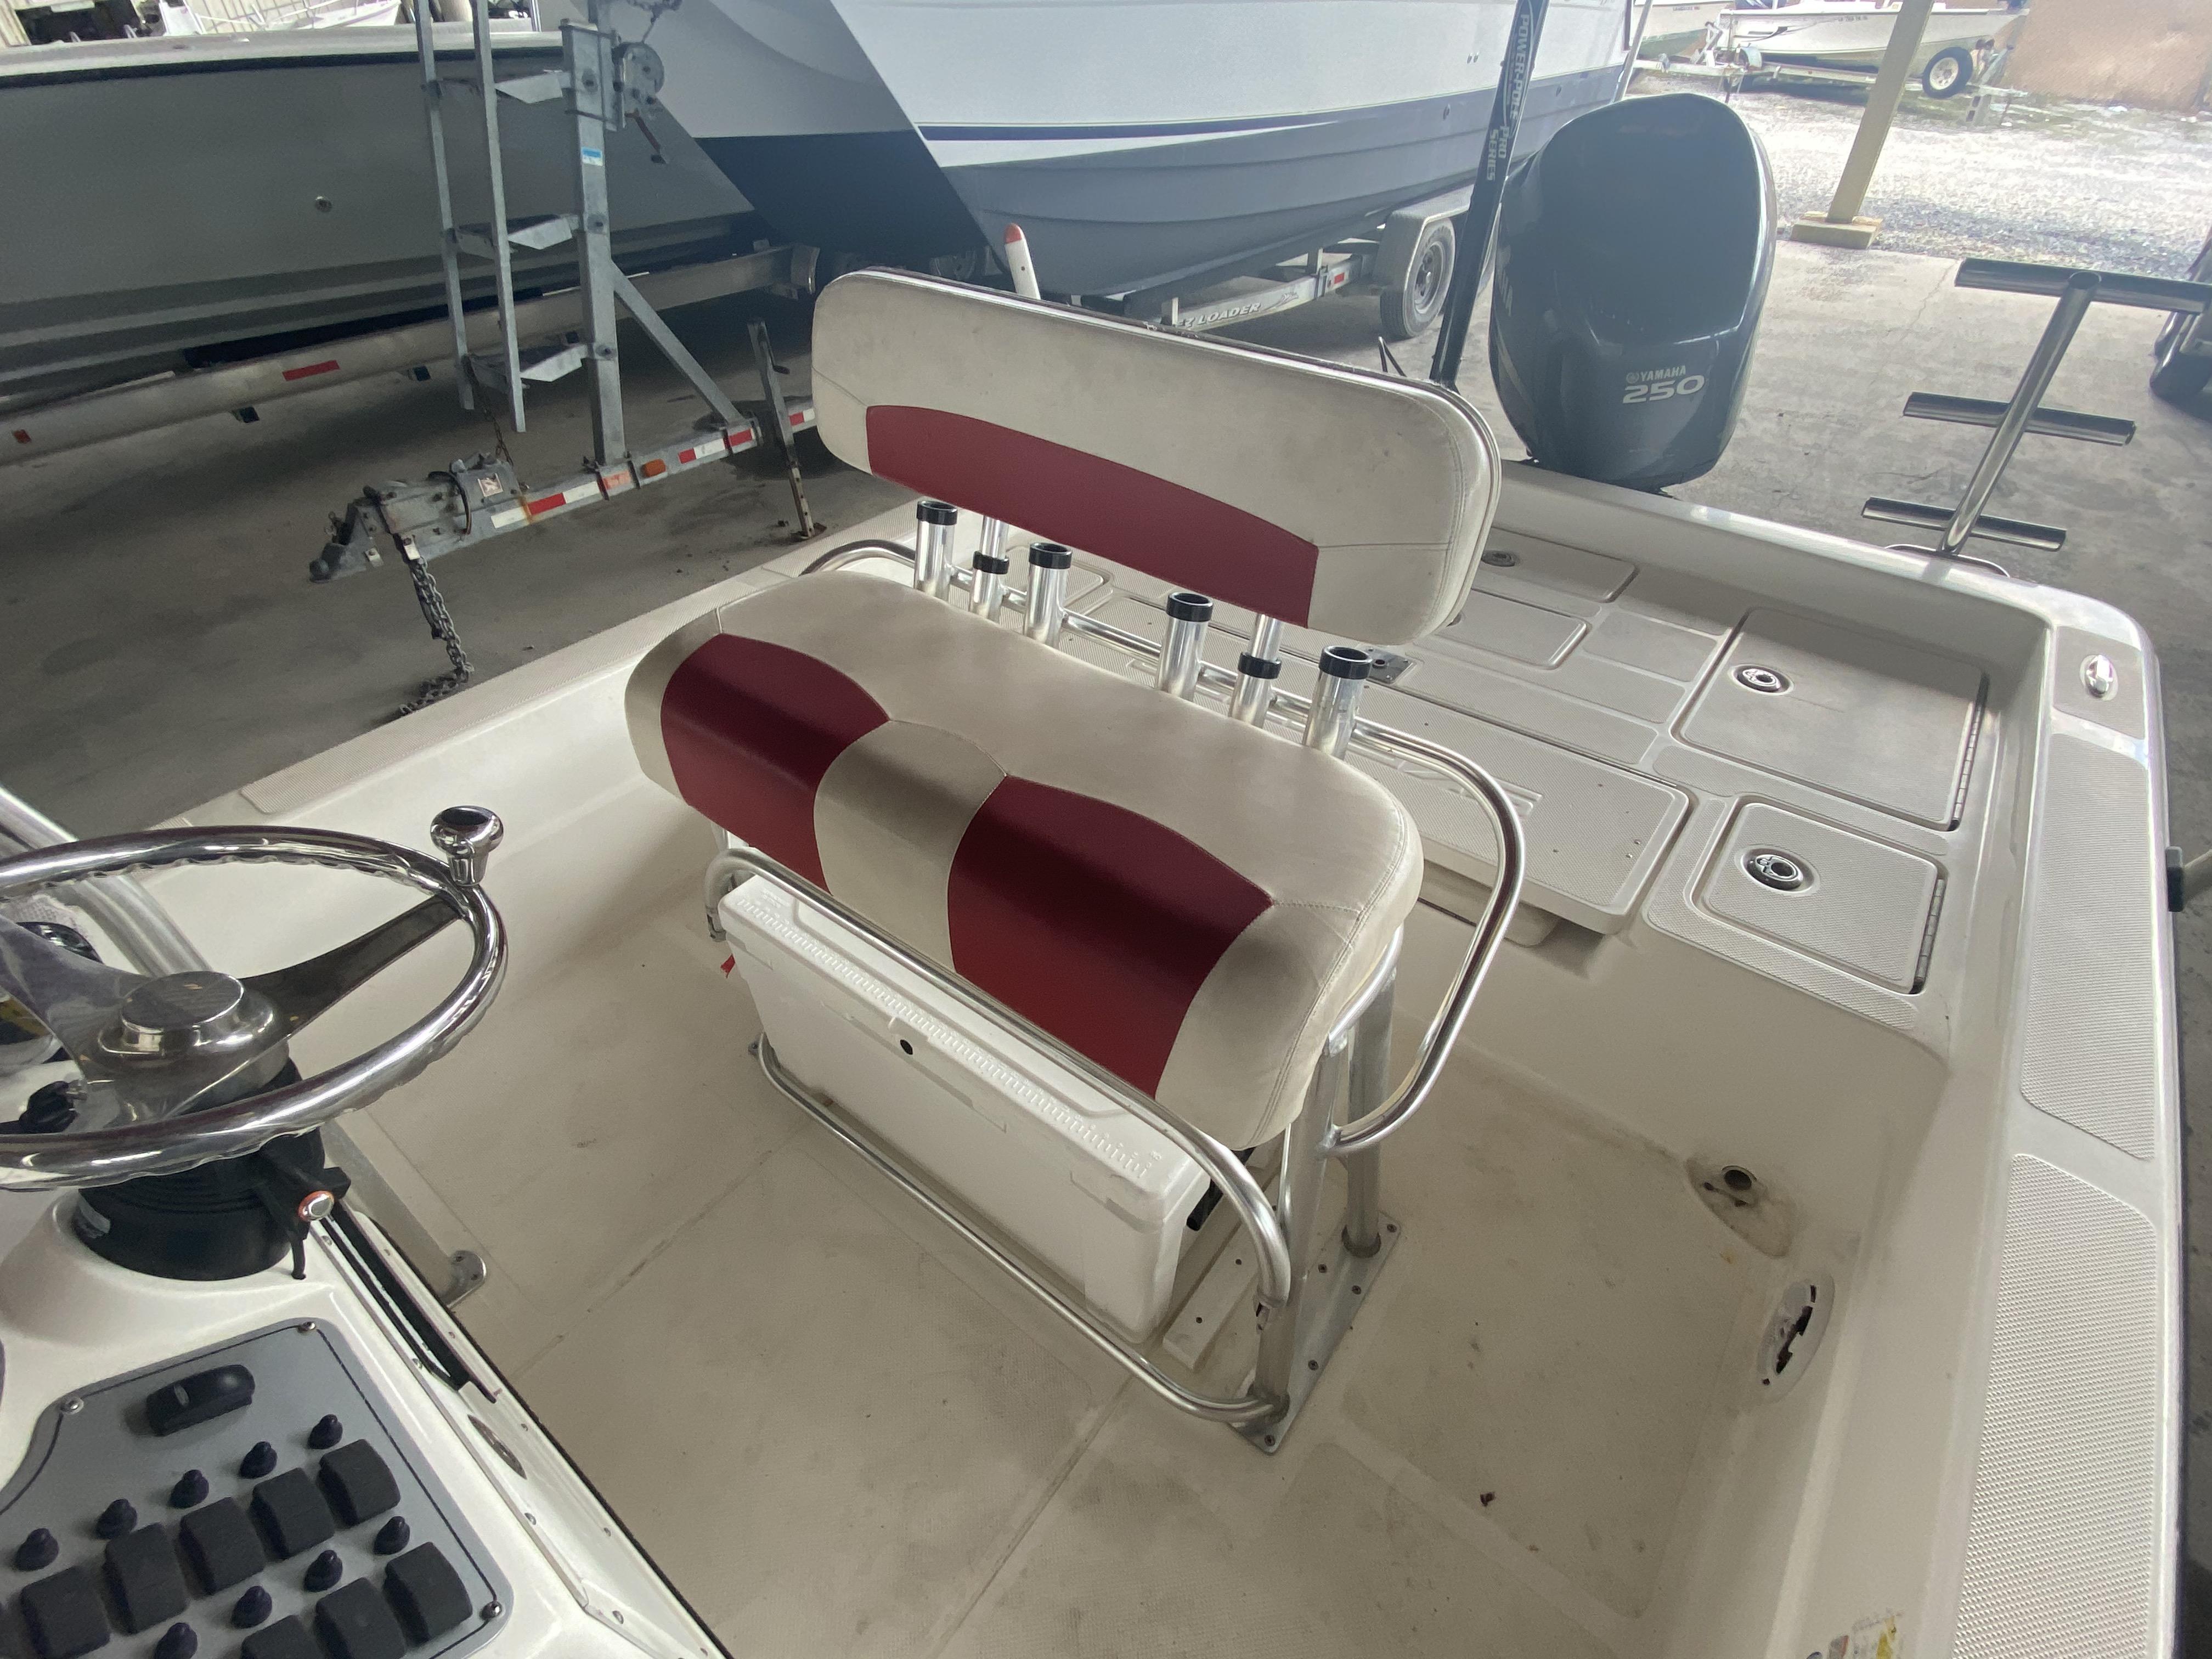 2010 Skeeter boat for sale, model of the boat is ZX24V & Image # 16 of 16